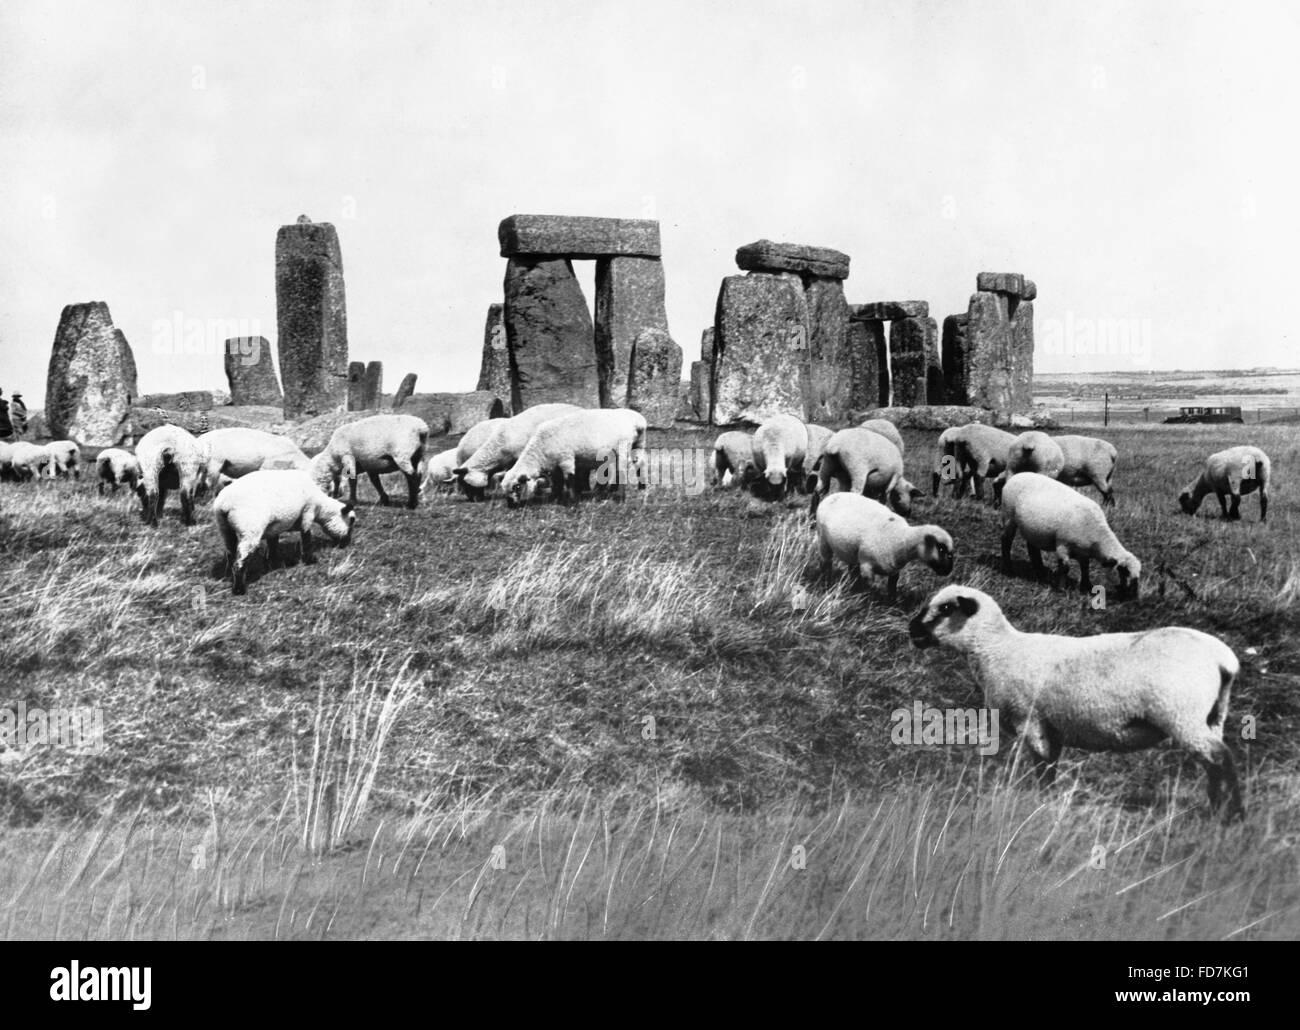 Sheep at Stonehenge in England, 1933 Stock Photo